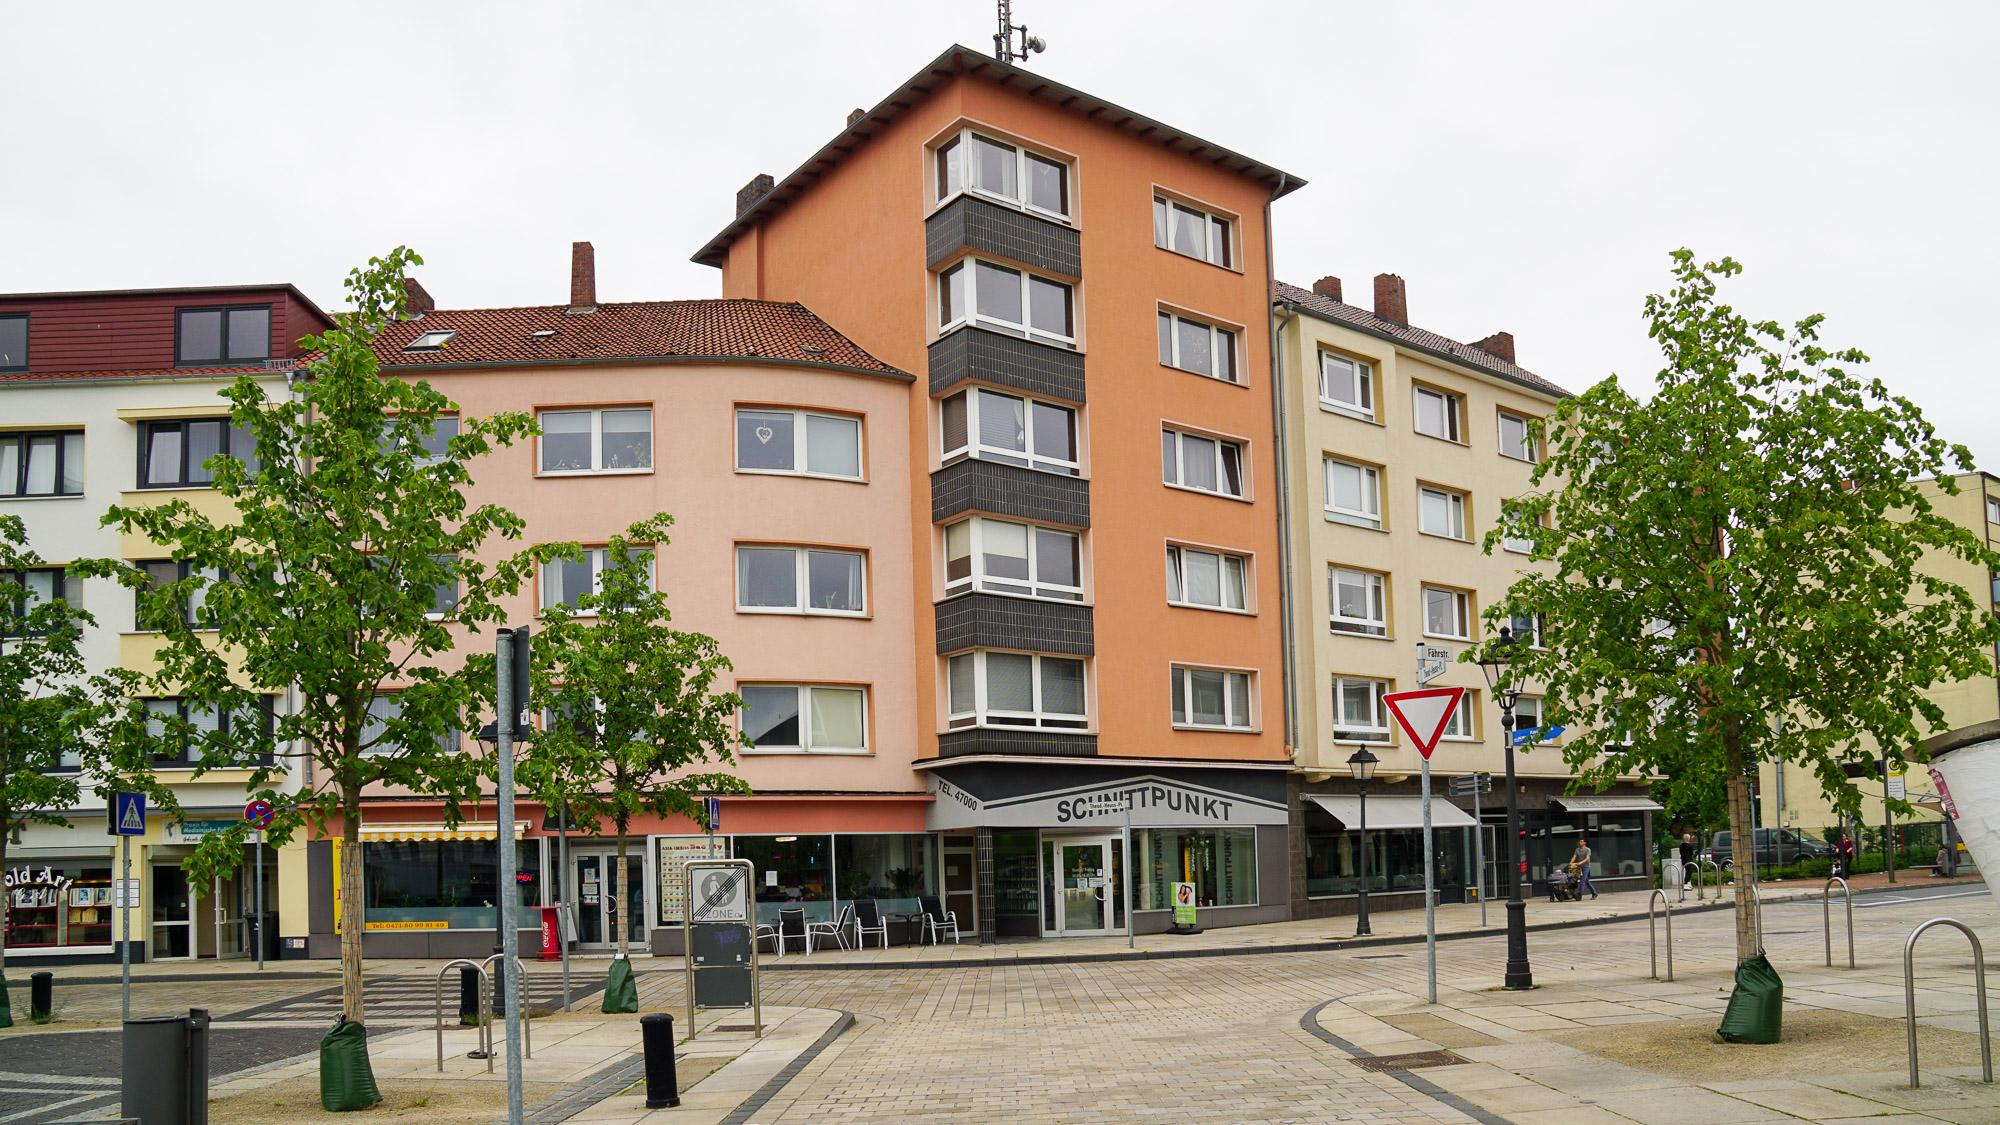 Wohnhäuser mit Geschäften im Erdgeschoss in kräftigen Ockertönen